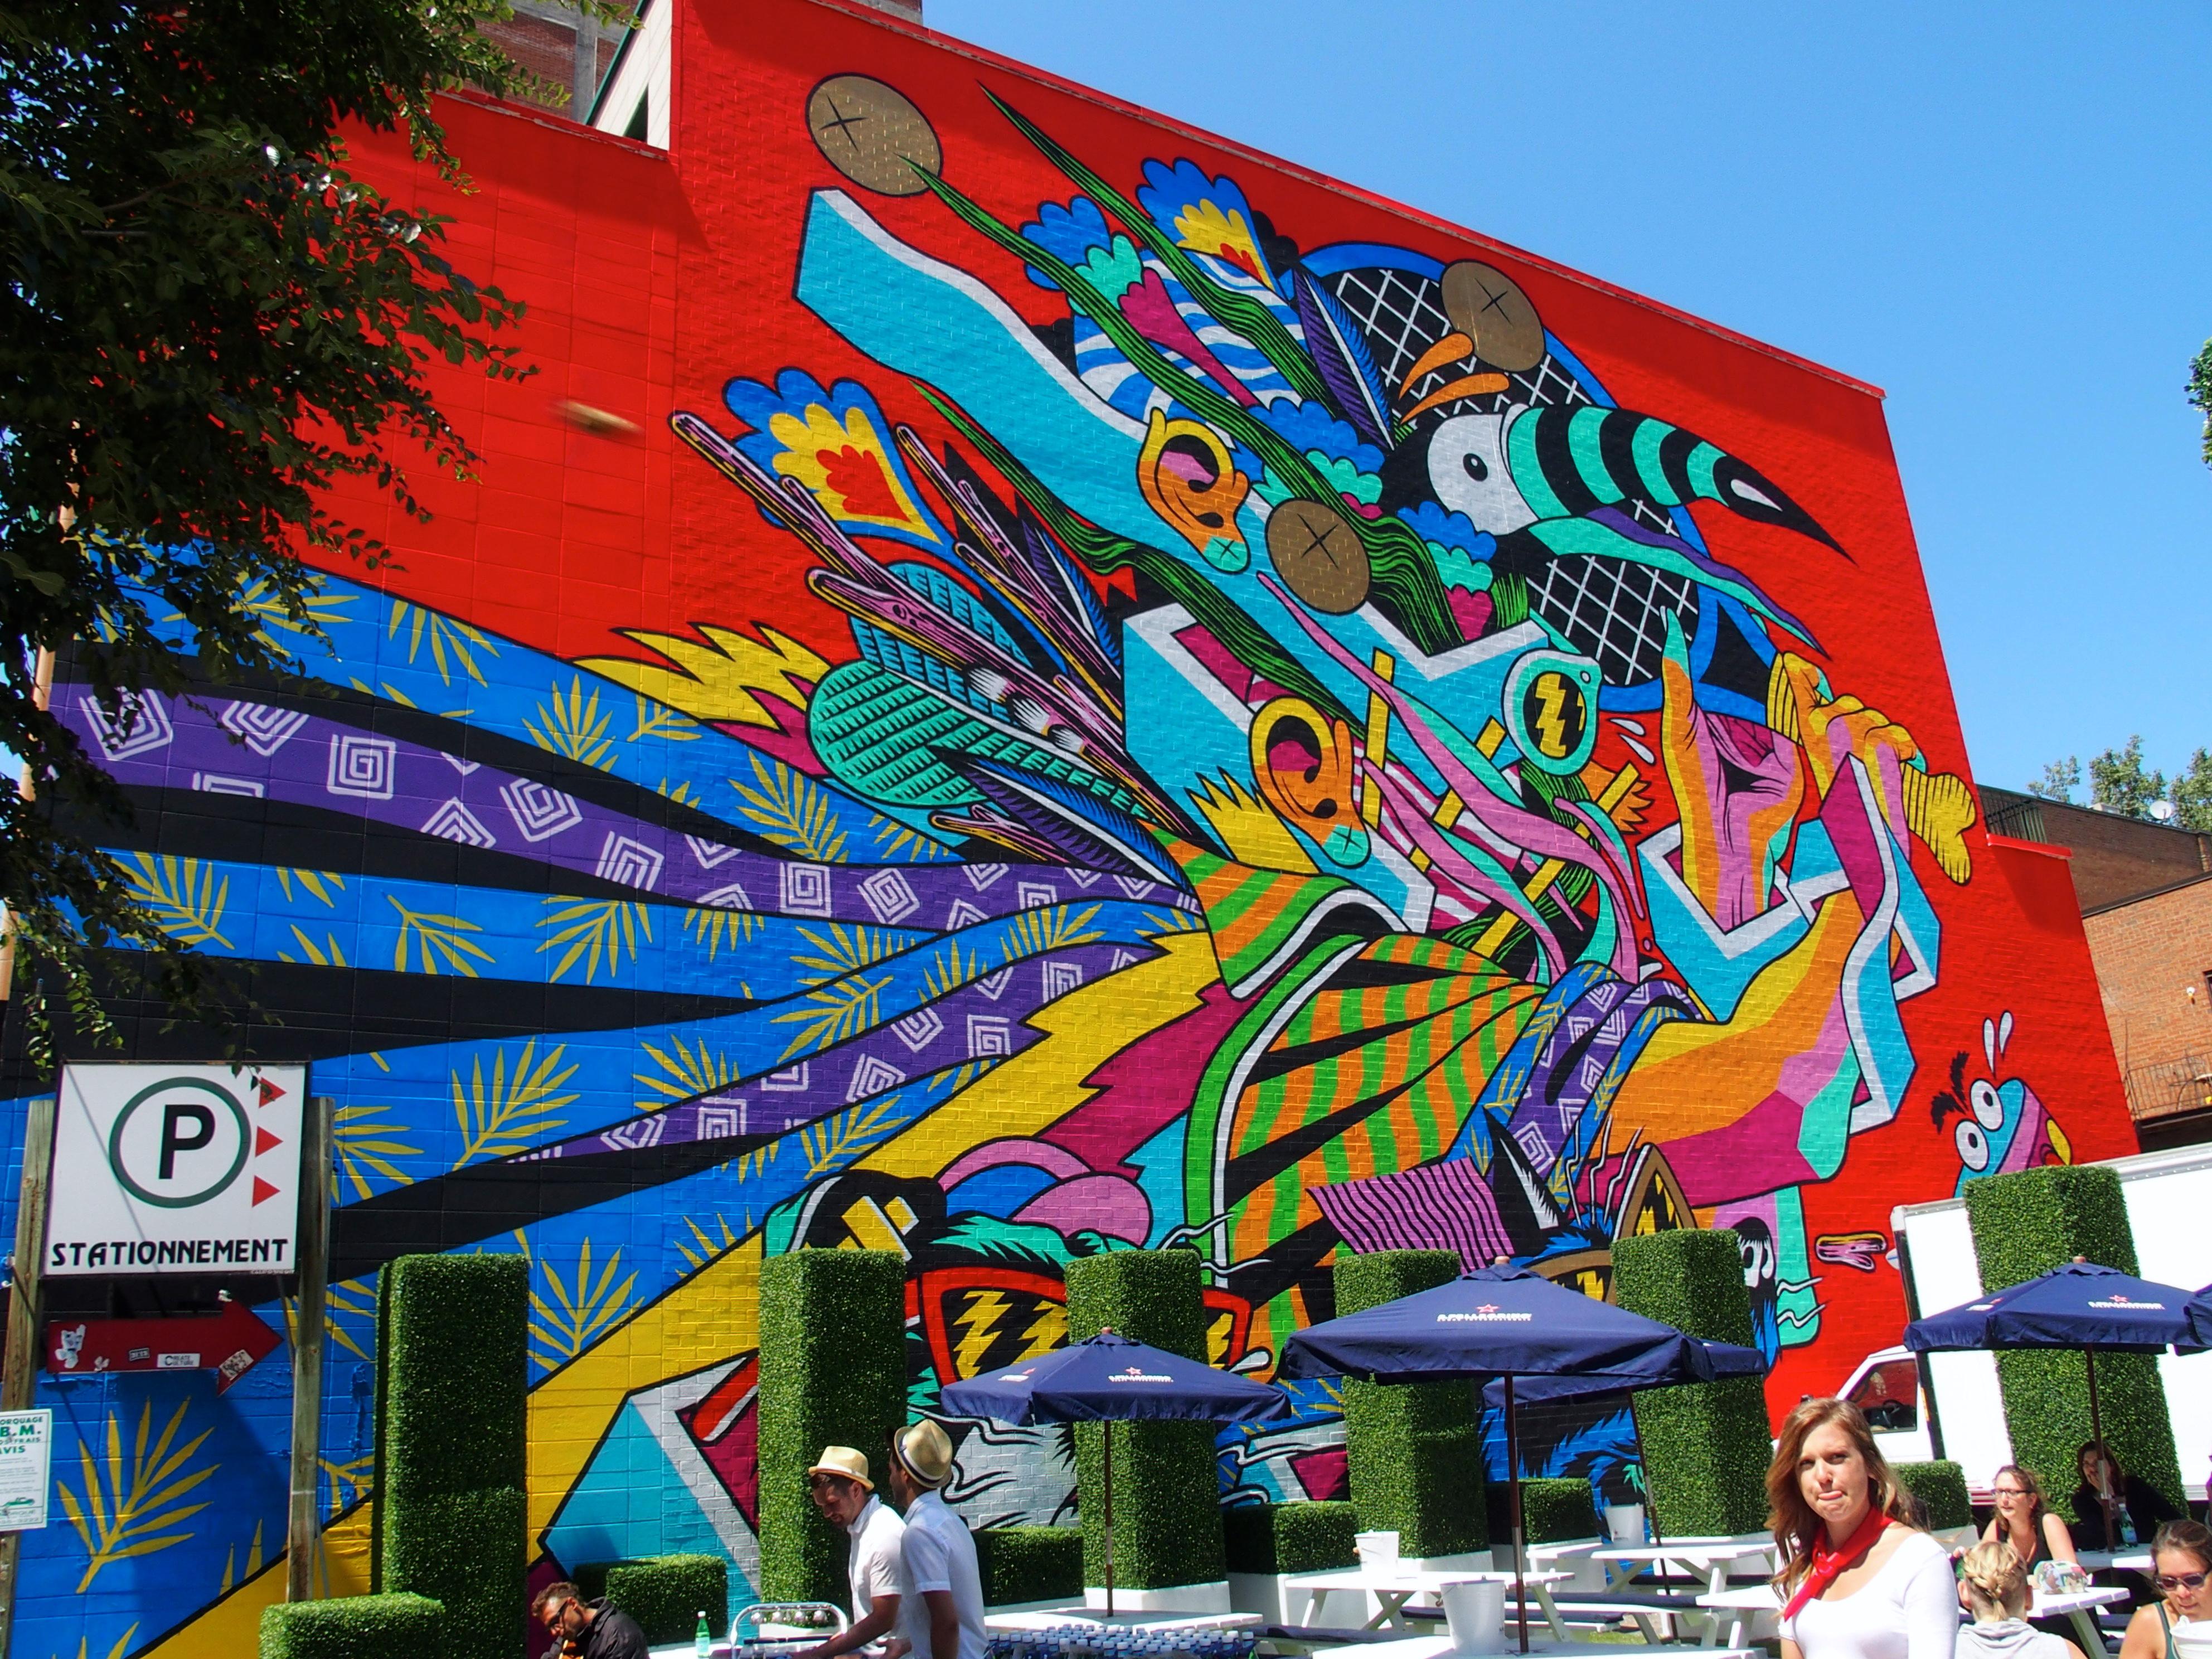 Checking out cool street art in montreal yoko 39 s haute for Art du monde